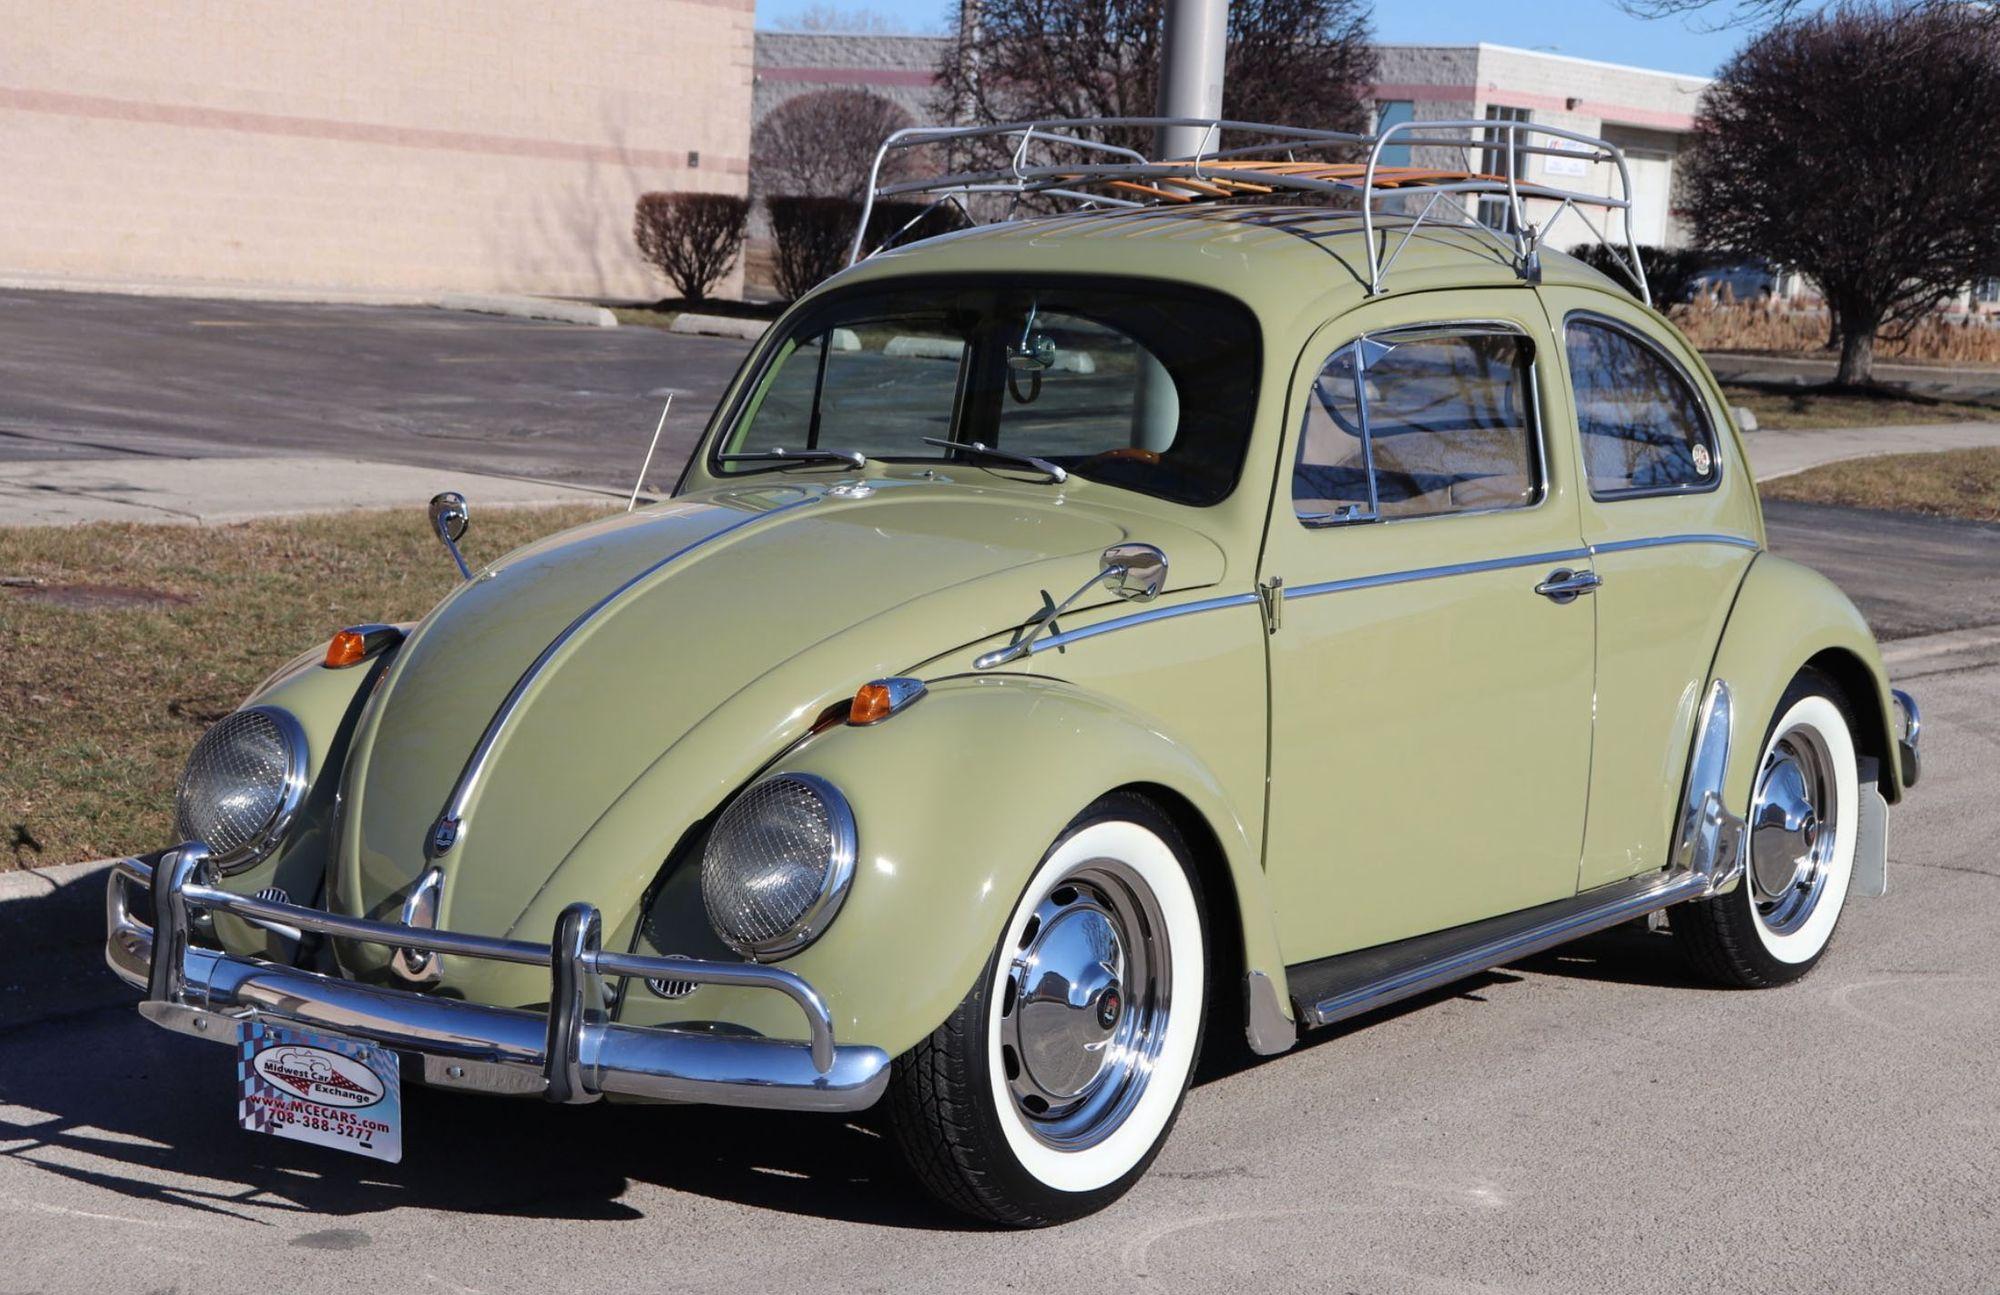 "<img src=""1960-vw-beetle-front-three-quarters.jpg"" alt=""A stunning 1960 Volkswagen Beetle up for grabs"">"